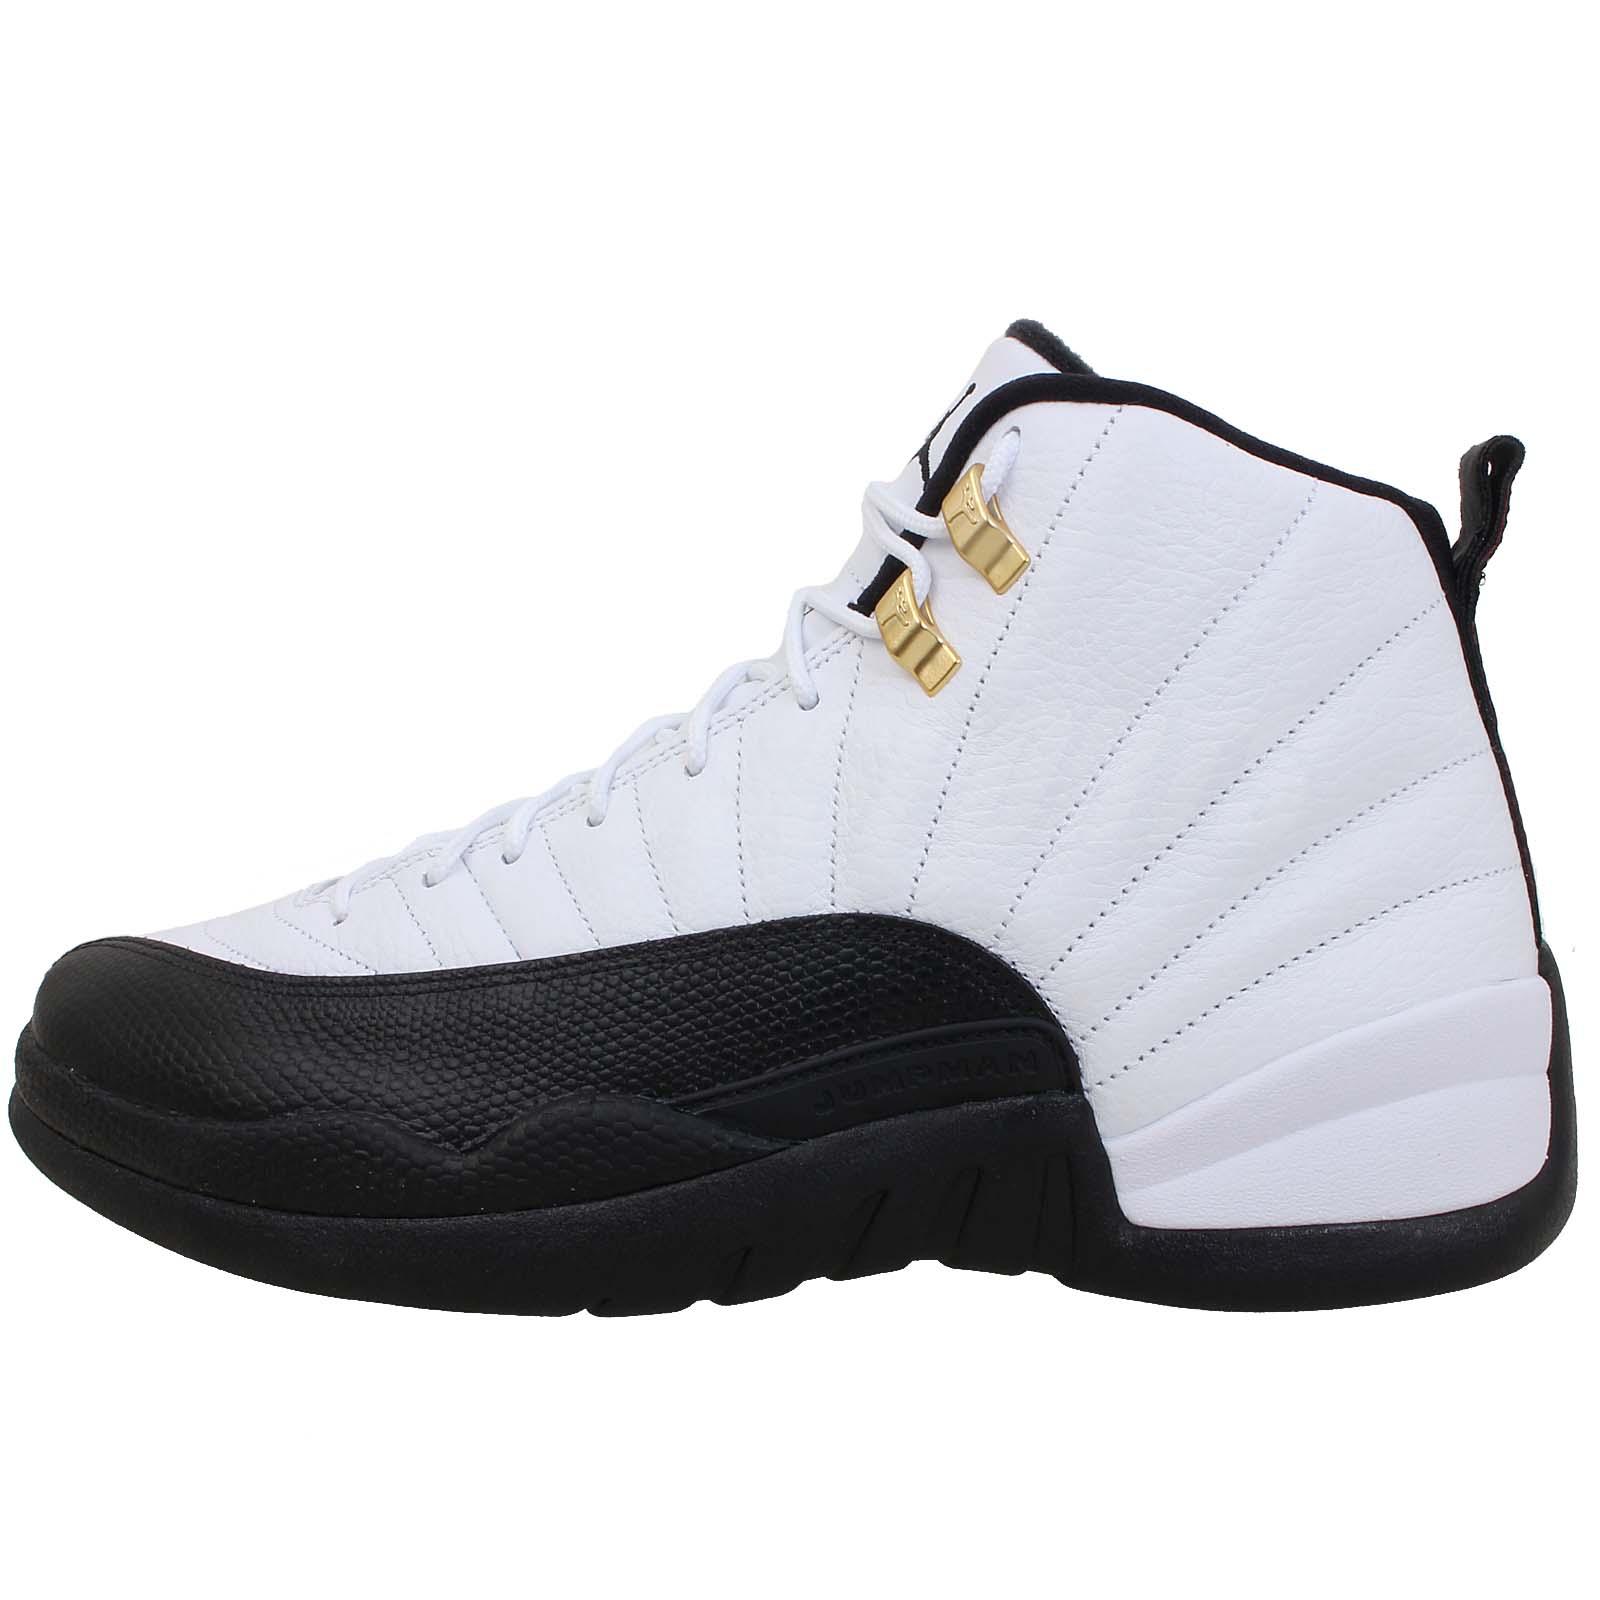 separation shoes 97eb9 2481f ... promo code for discount air jordan 18 original black chrome university  cheap fceb4 6dfb5 ...